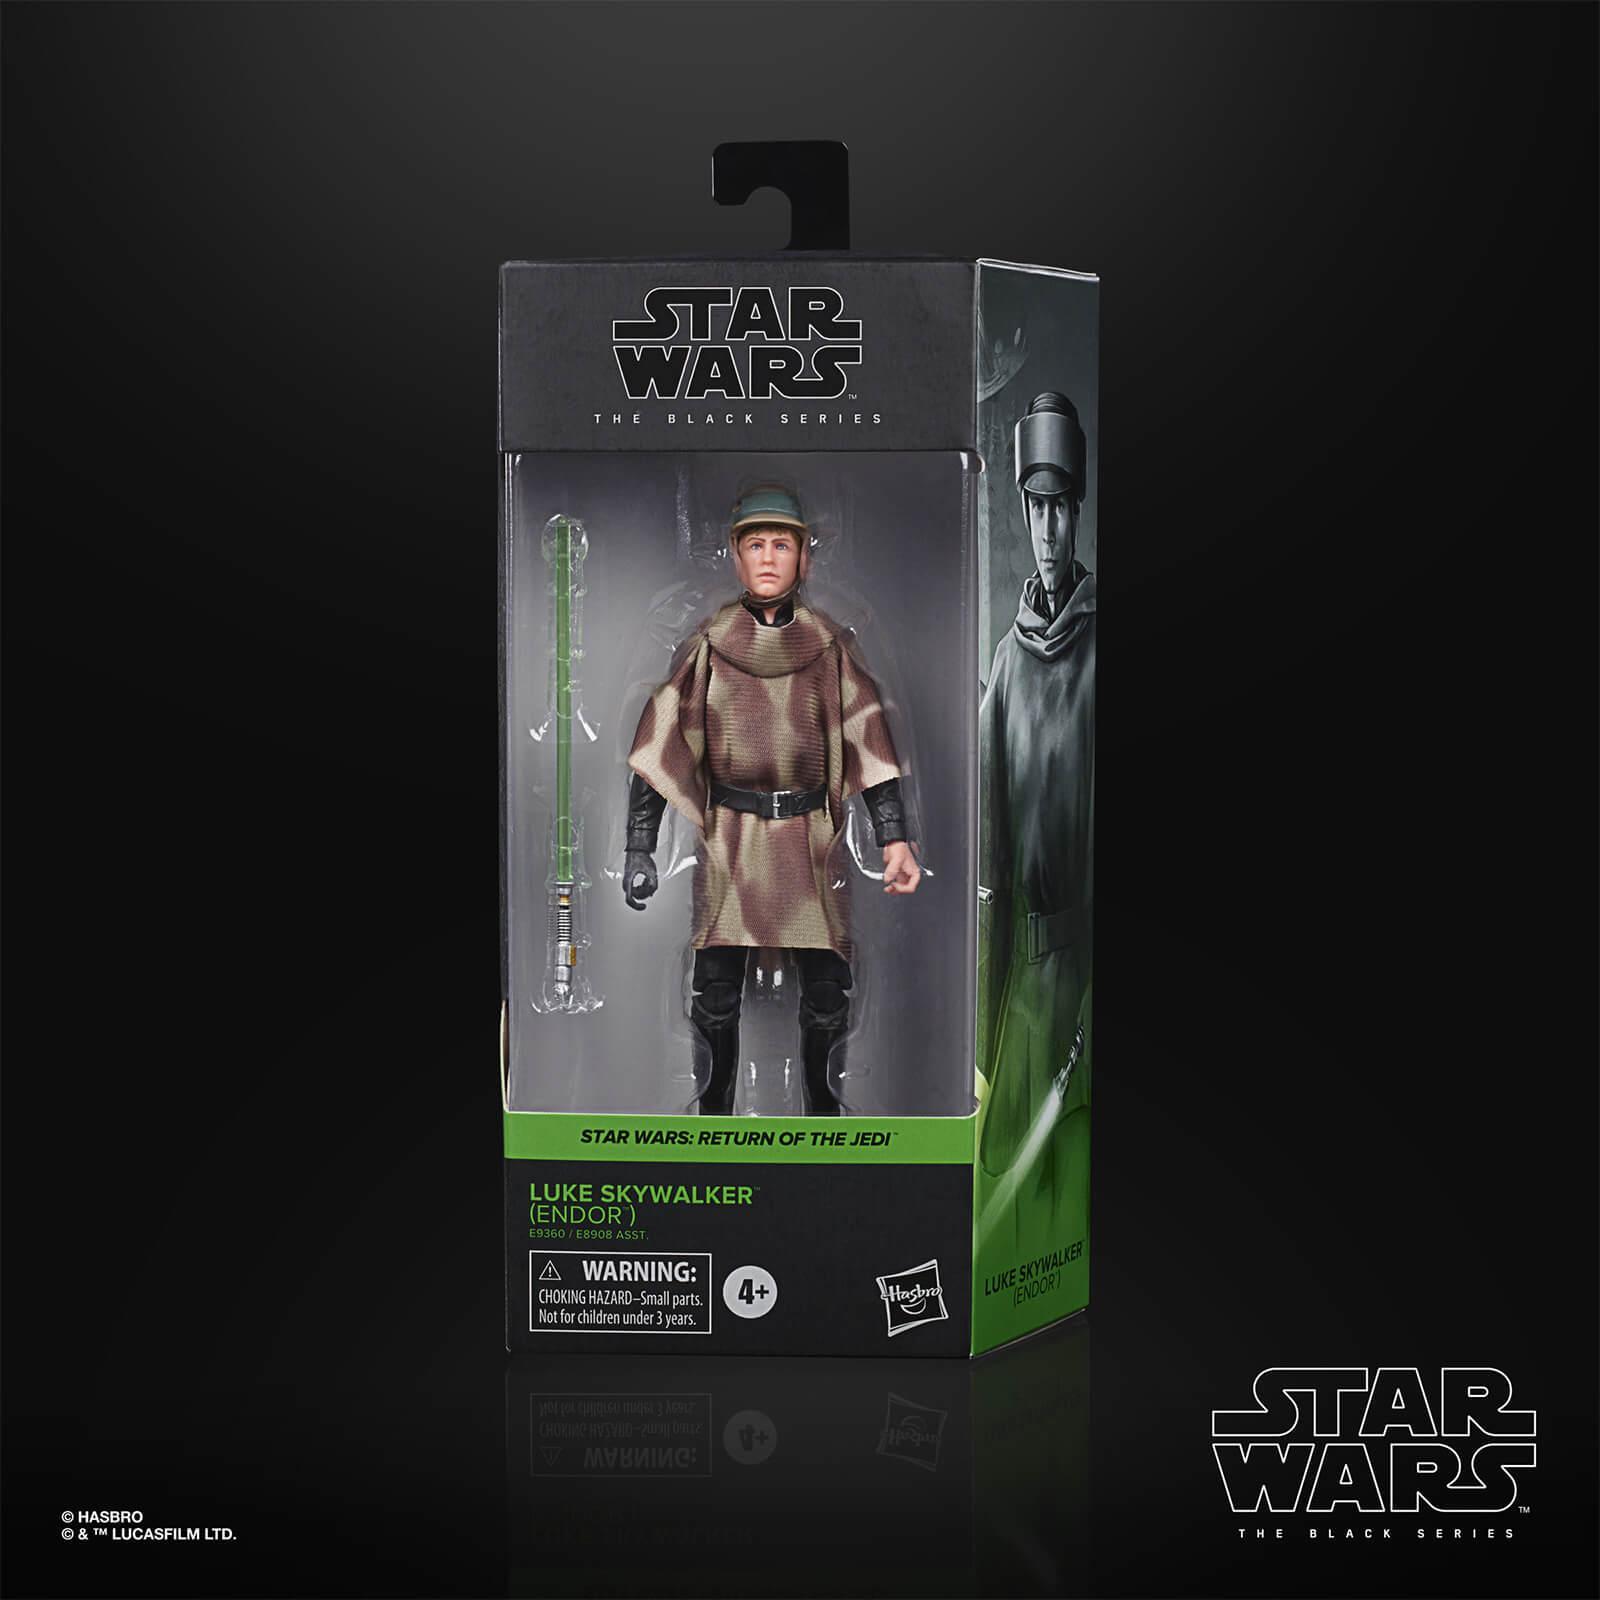 Star wars the black series luke skywalker endor 15cm